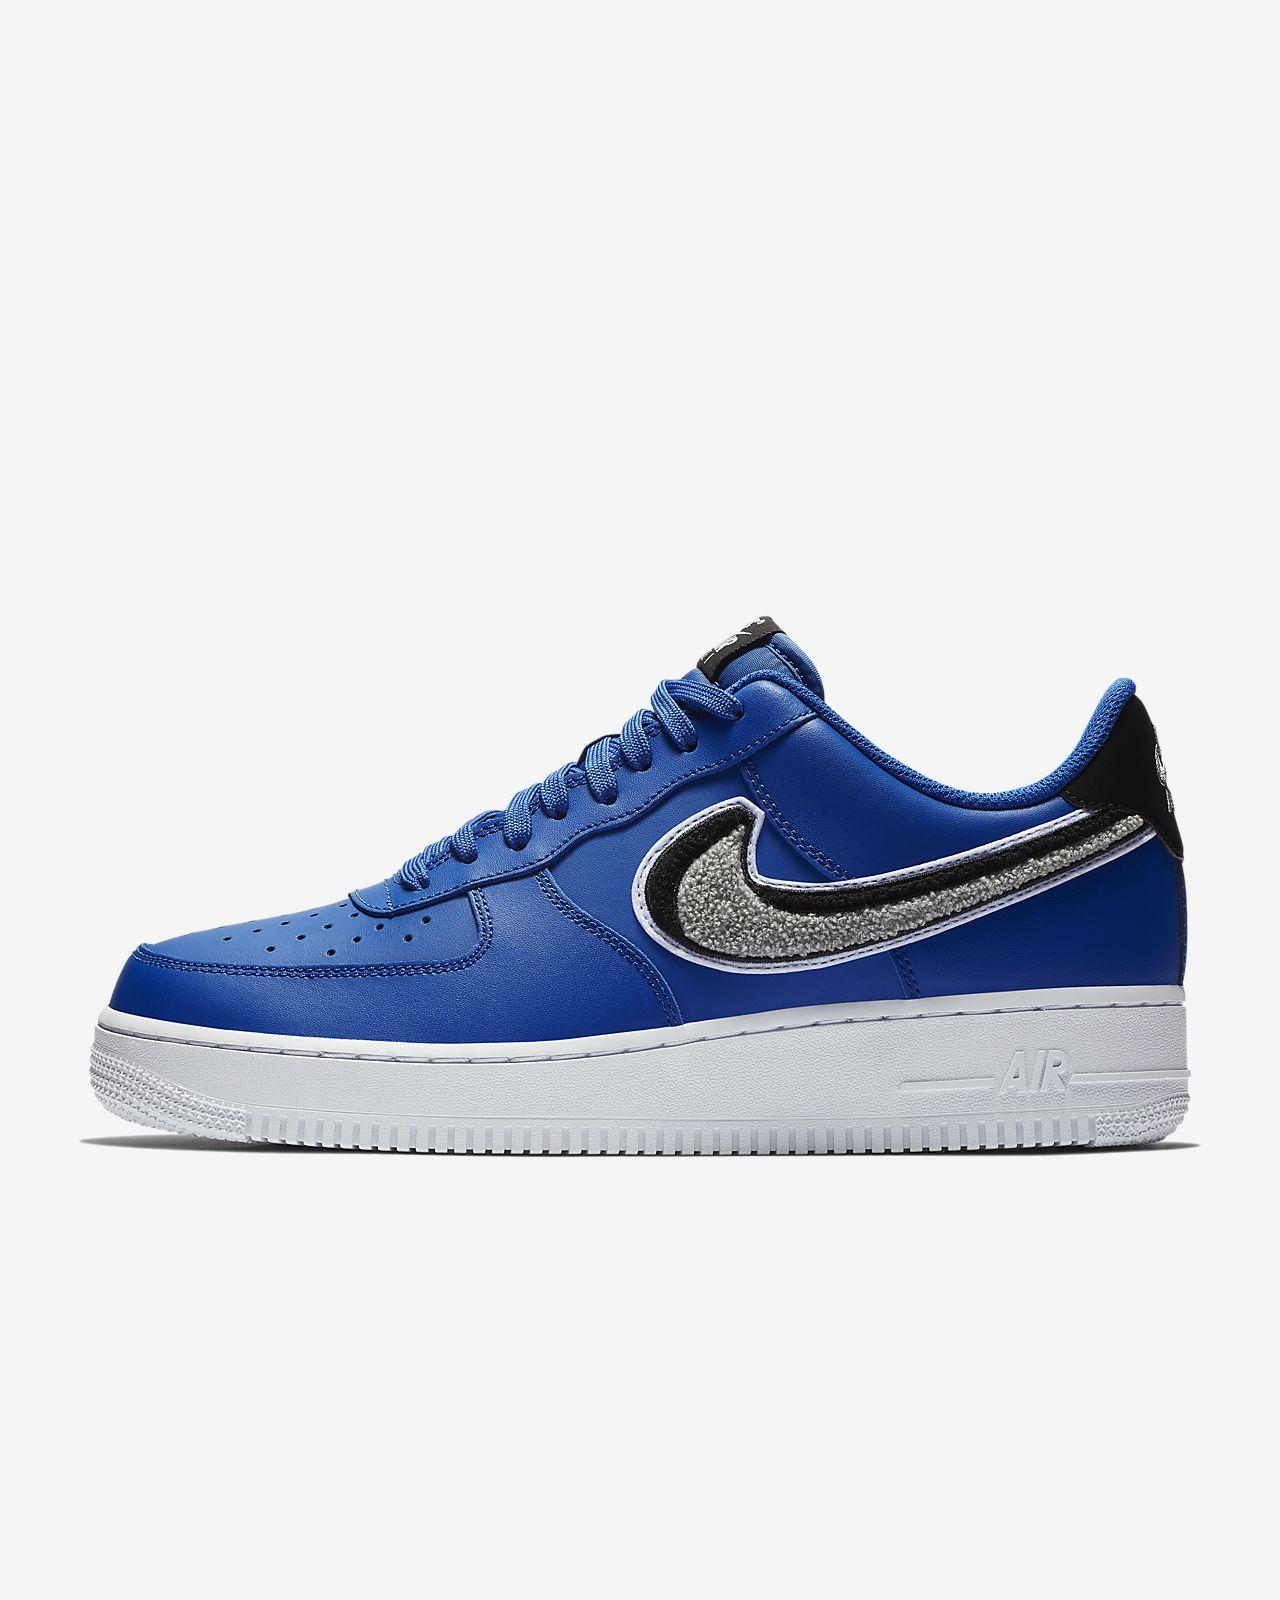 nike air force 1 basse. Modren Air Nike Air Force 1 Low 07 LV8 Menu0027s Shoe Throughout Basse 0